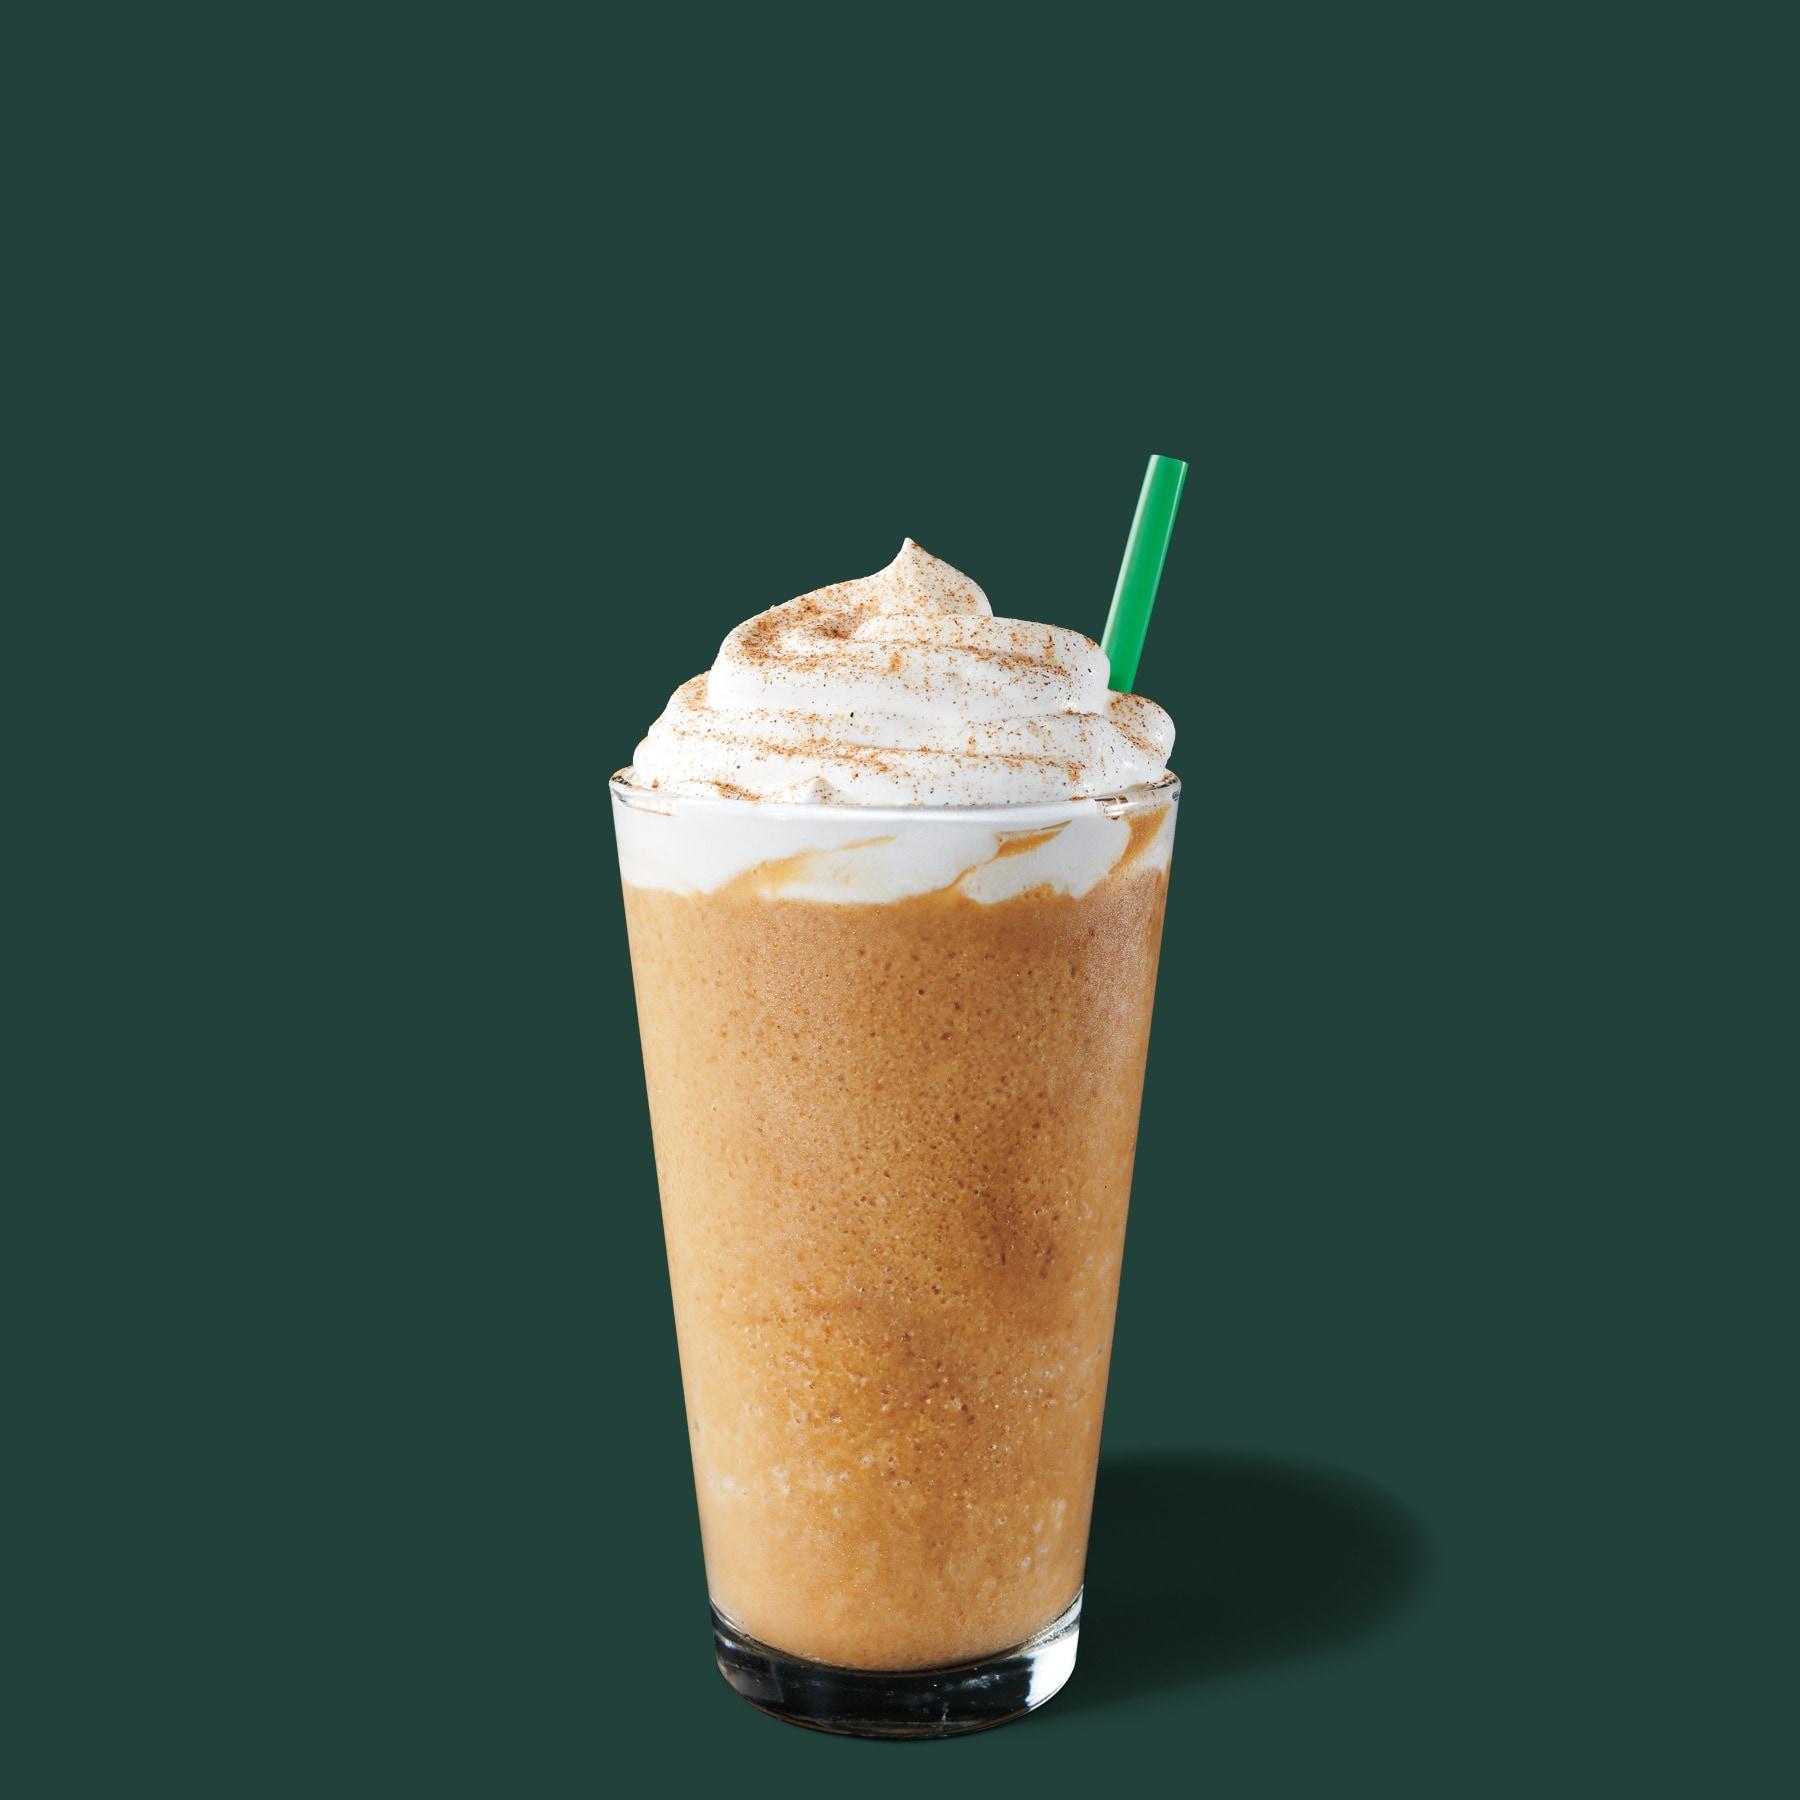 Pumpkin Spice Frappuccino® Blended Beverage | Starbucks